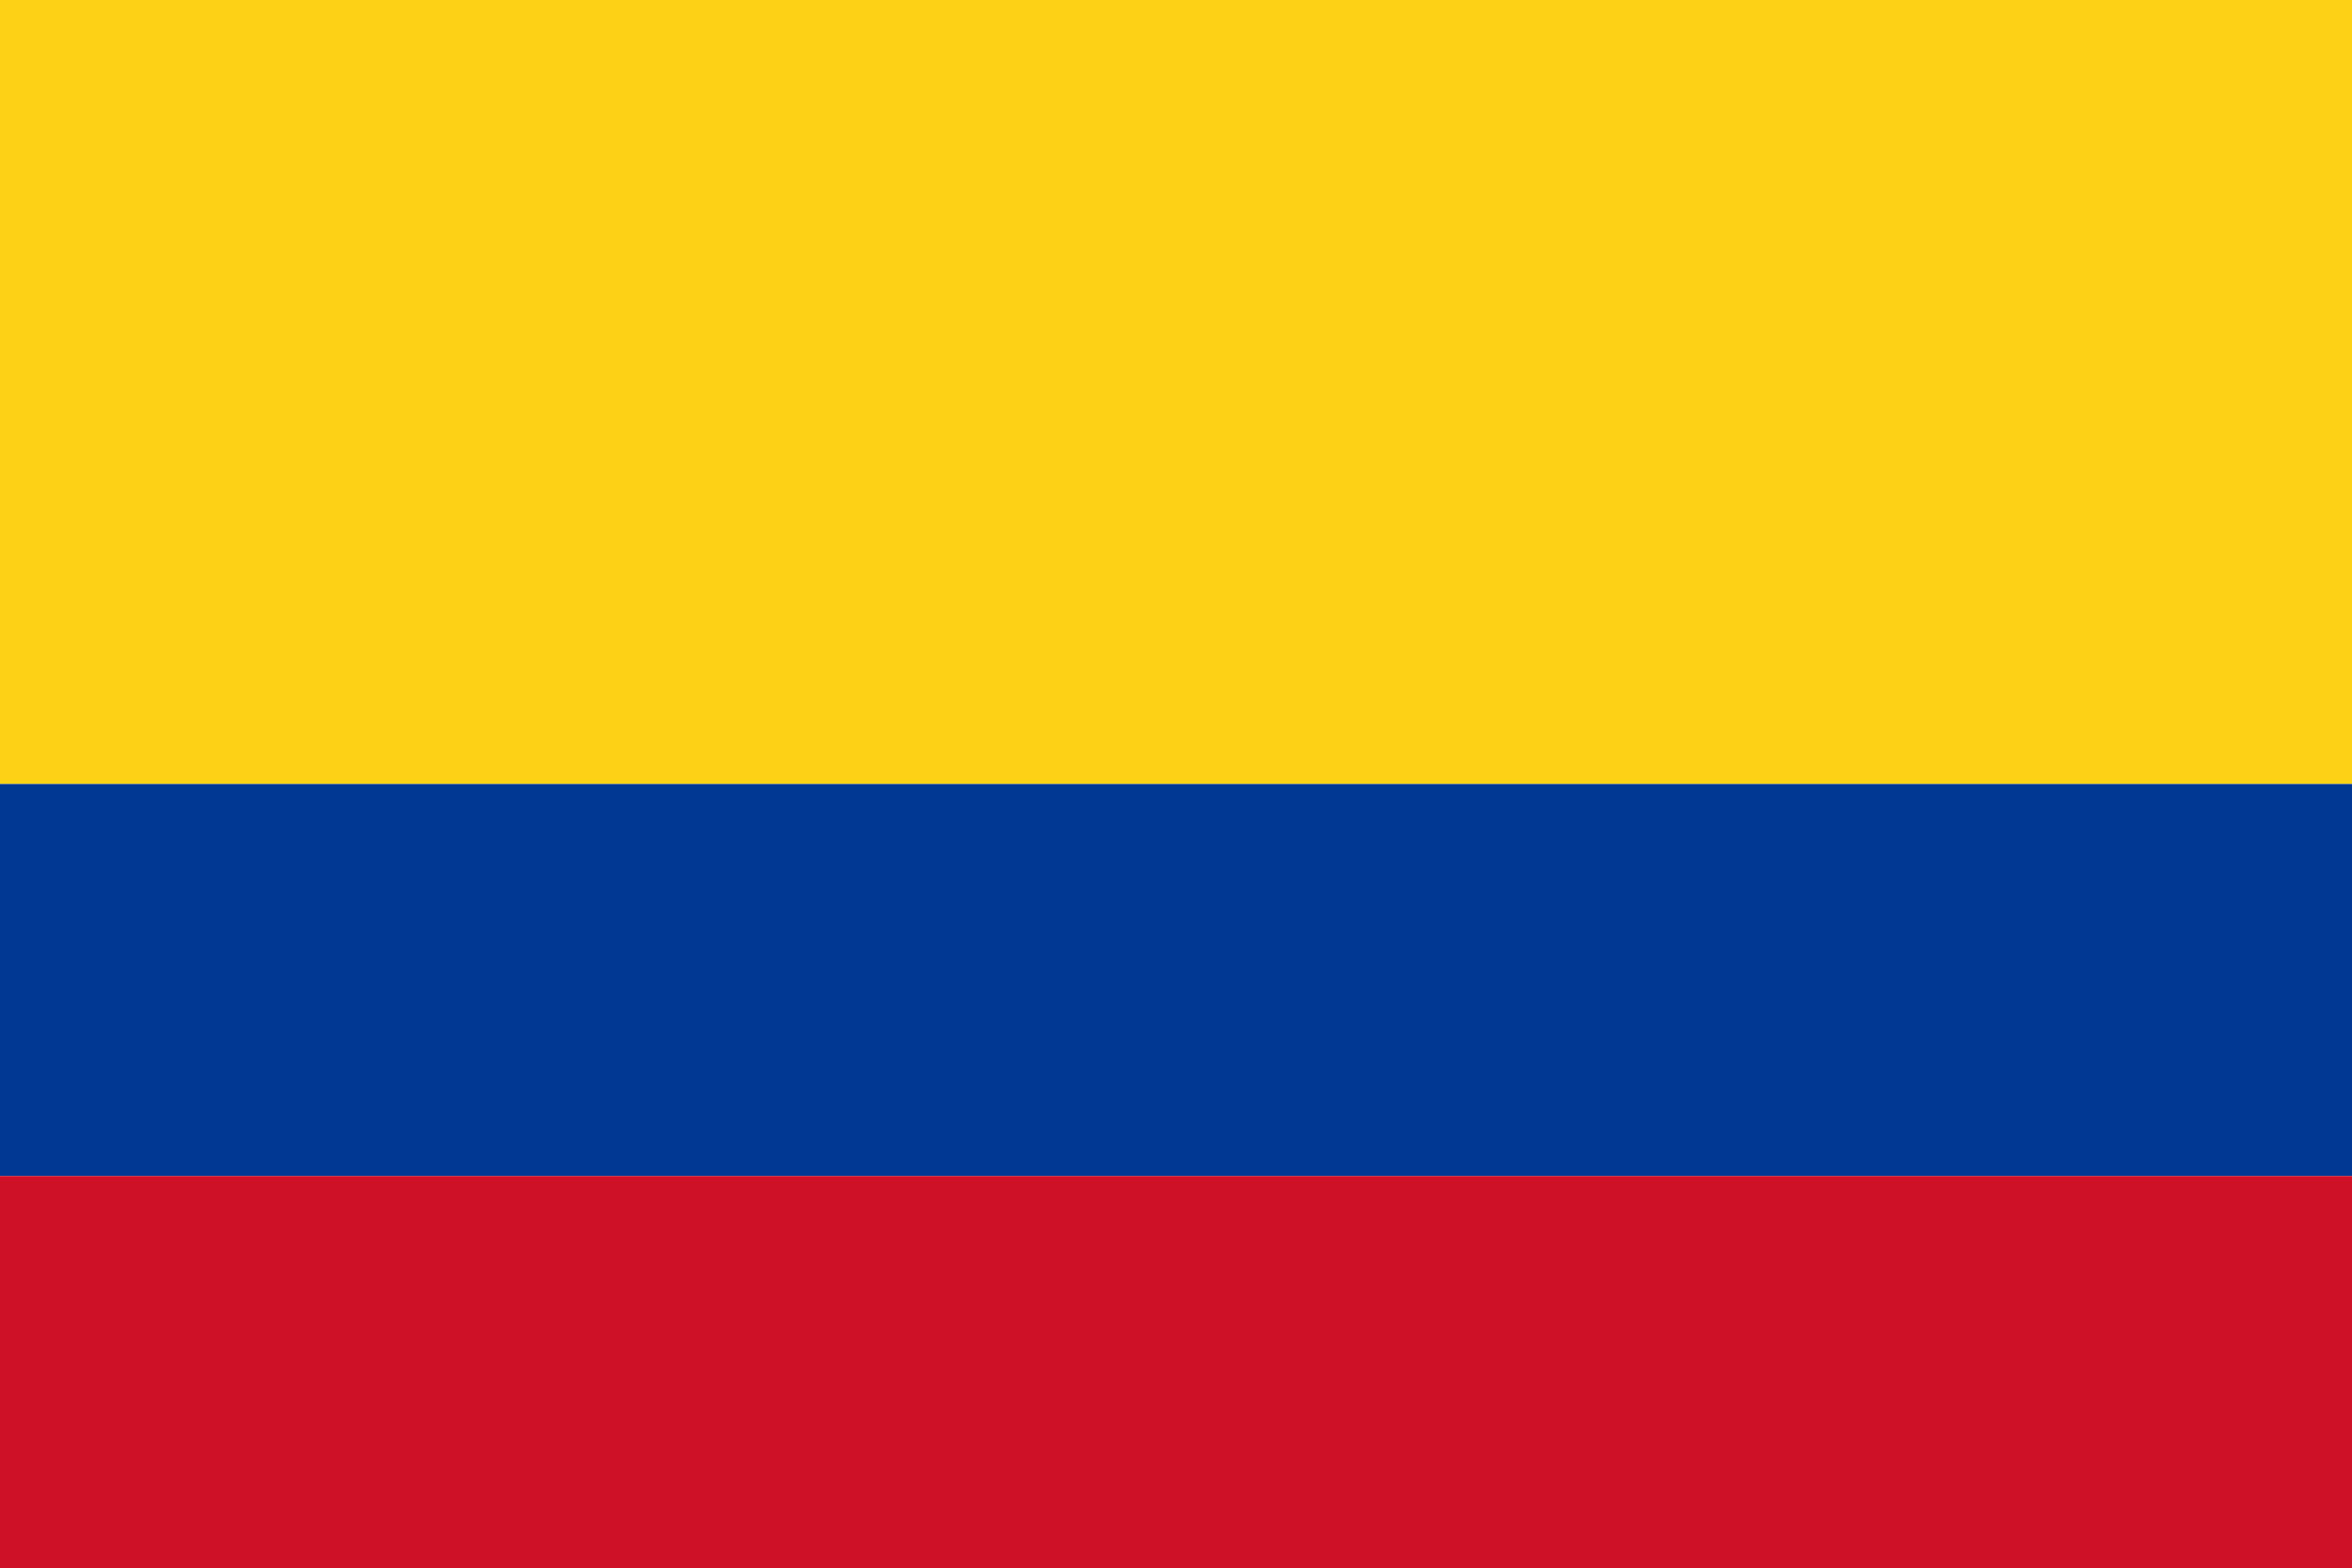 Kolumbien, Land, Emblem, Logo, Symbol - Wallpaper HD - Prof.-falken.com